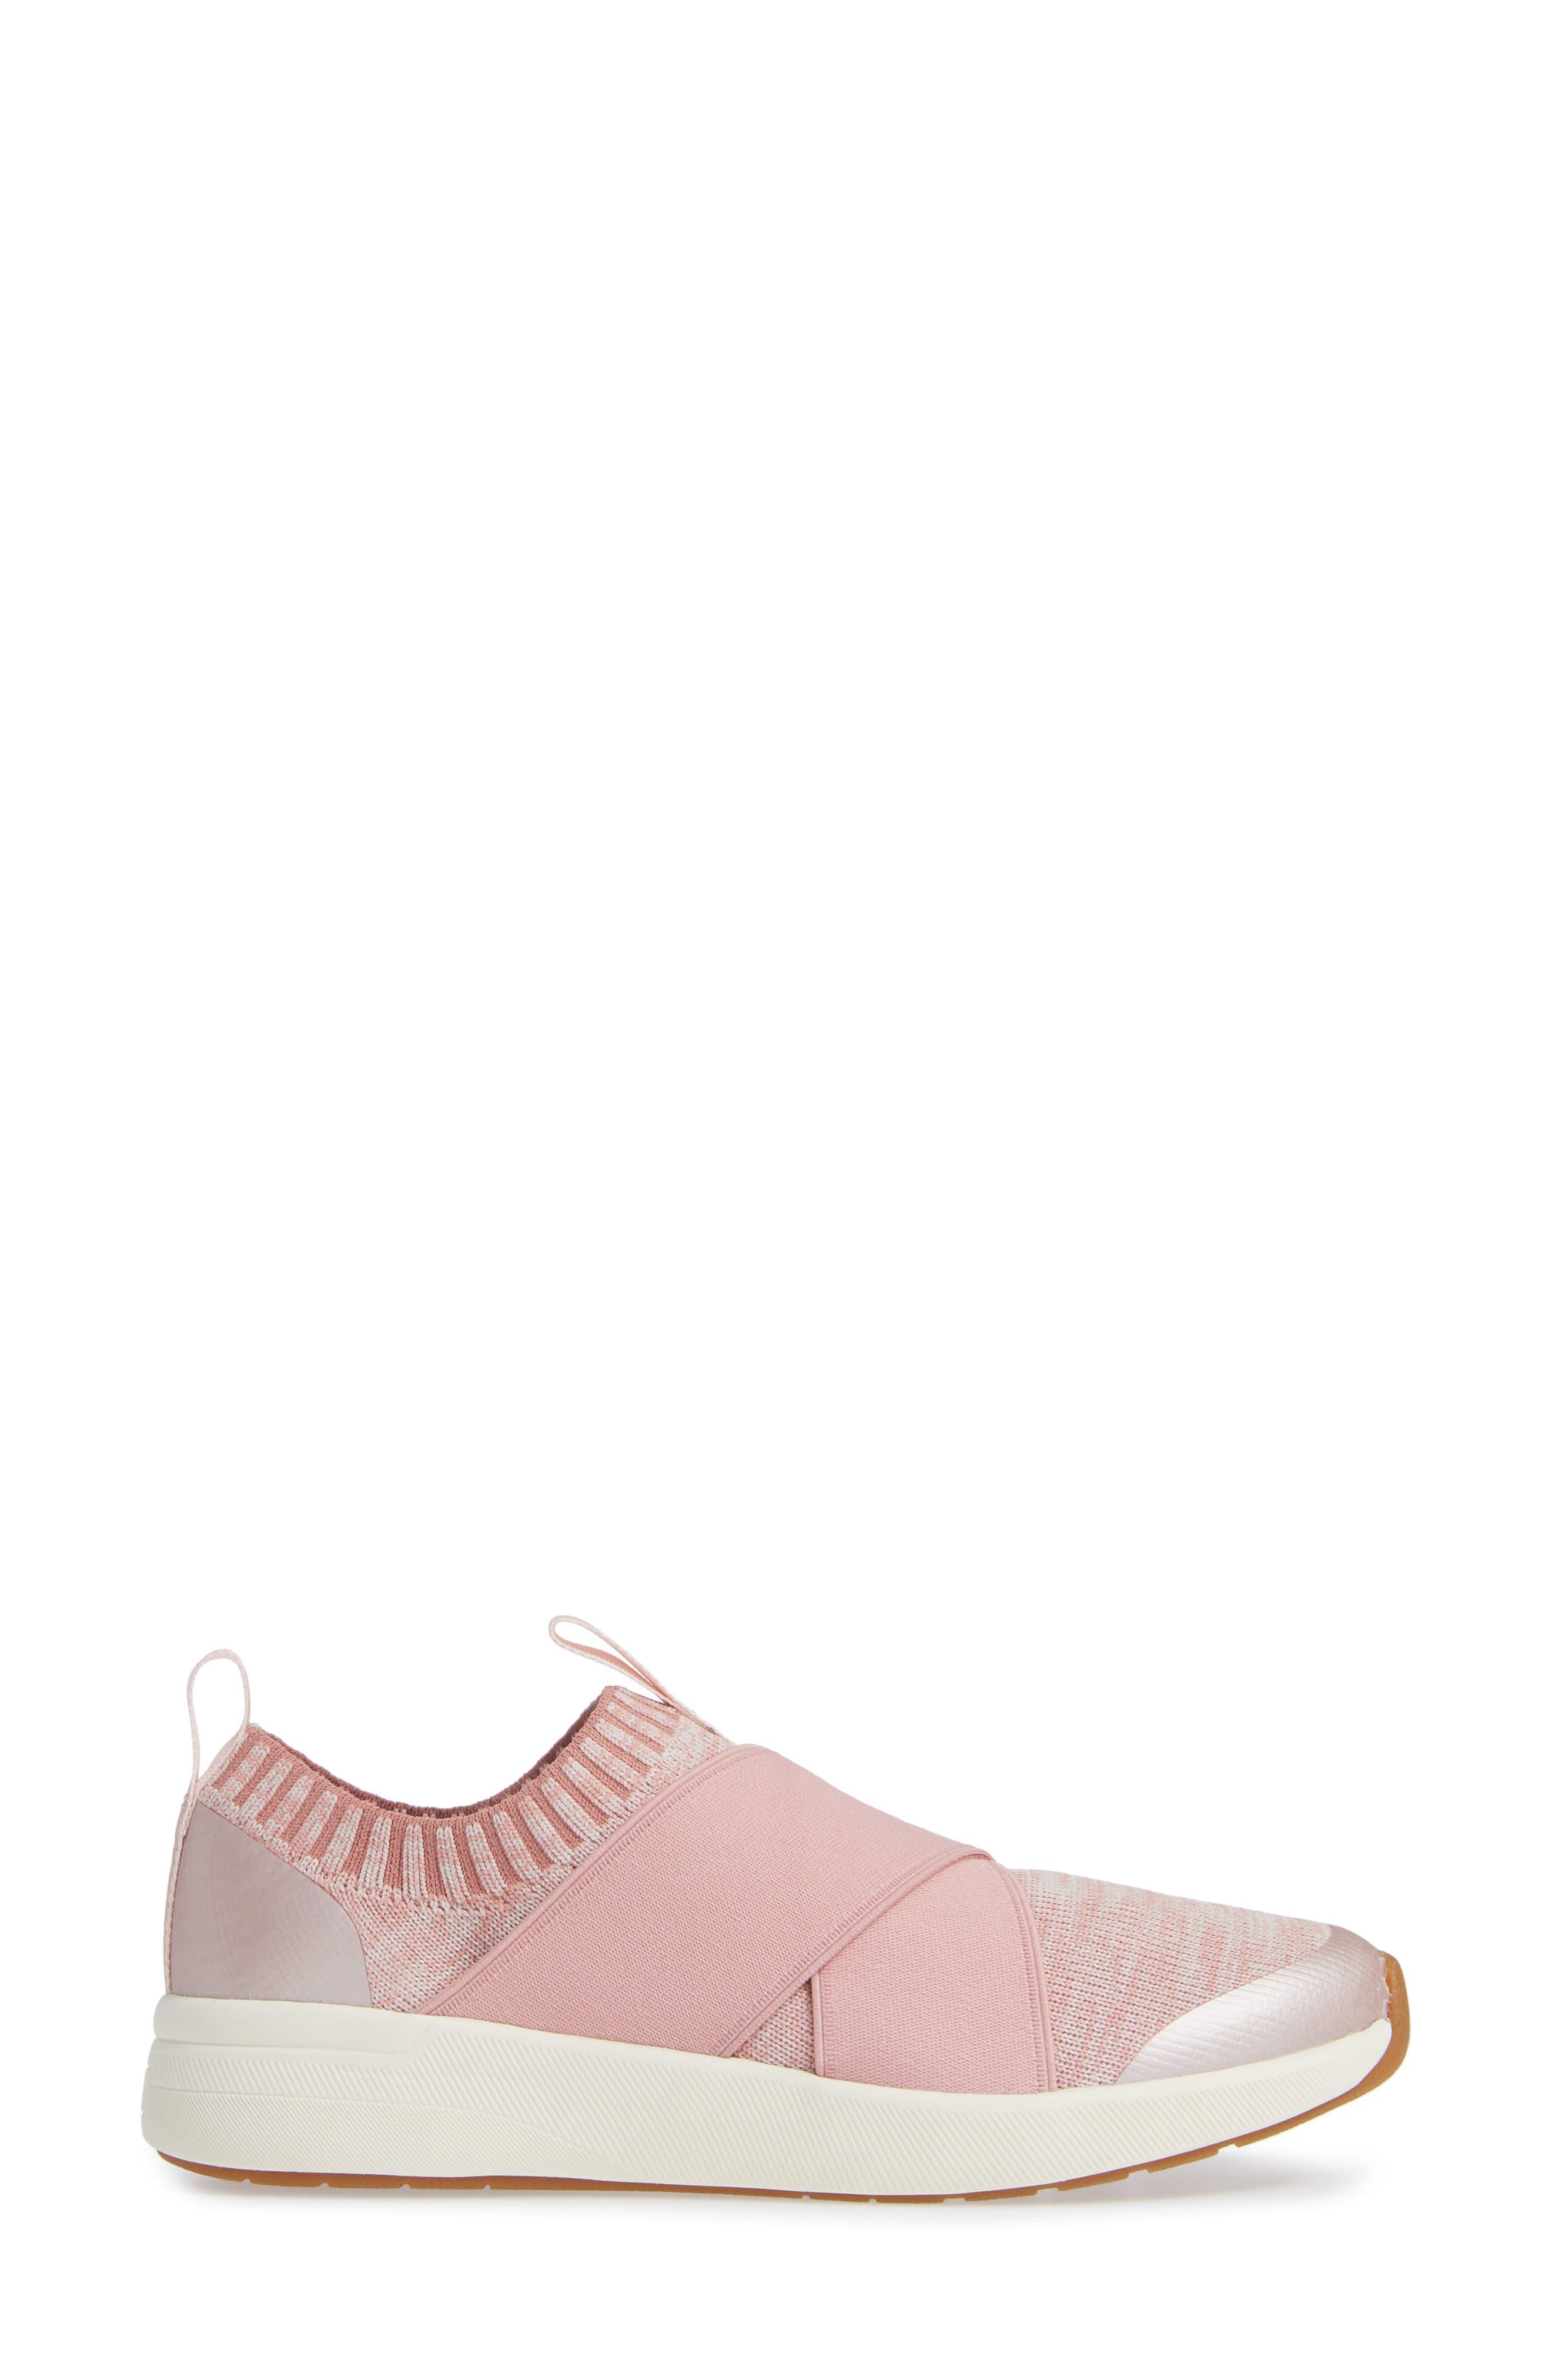 KEDS<SUP>®</SUP>,                             Studio Jumper Knit Sneaker,                             Alternate thumbnail 3, color,                             LIGHT PINK